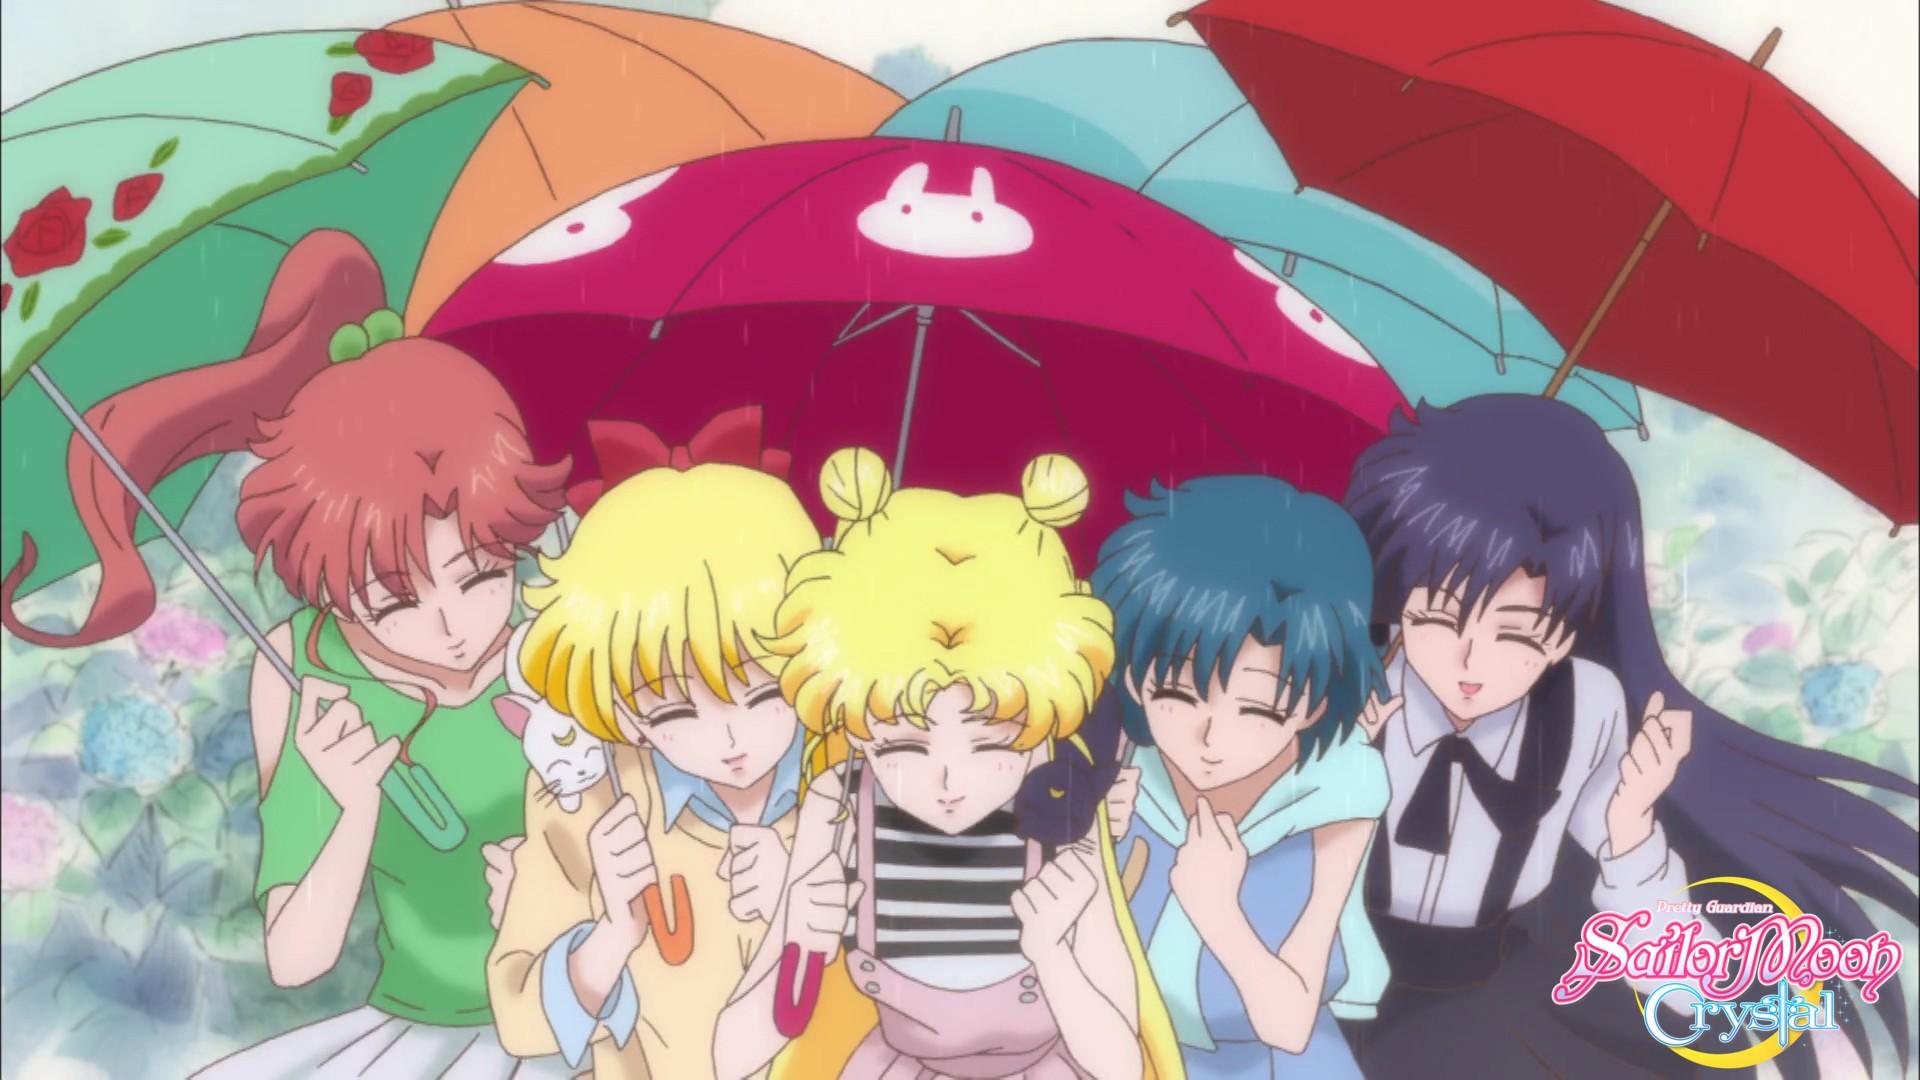 1920x1080 Sailor Moon Wallpaper Tumblr